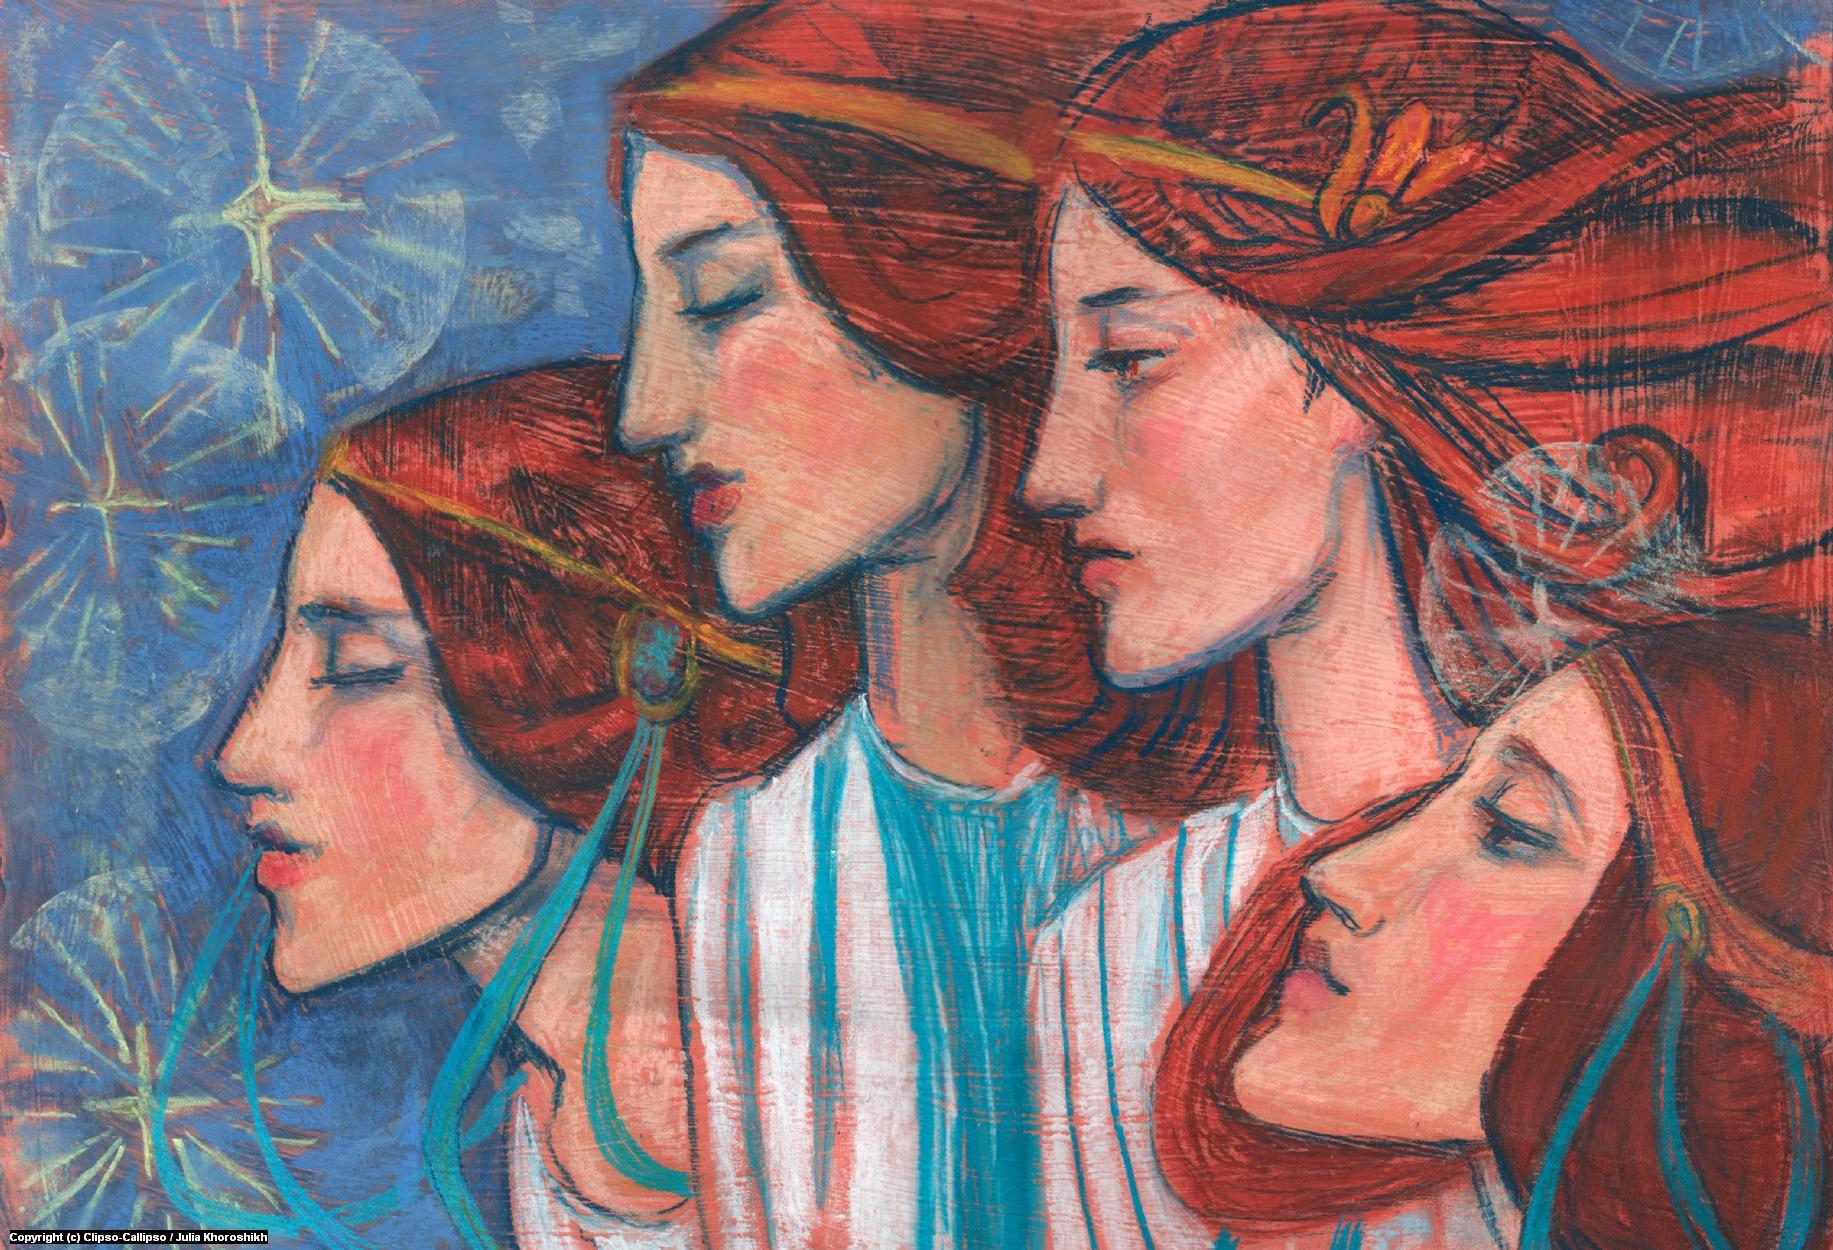 Tribute to Art Nouveau Artwork by Julia Khoroshikh